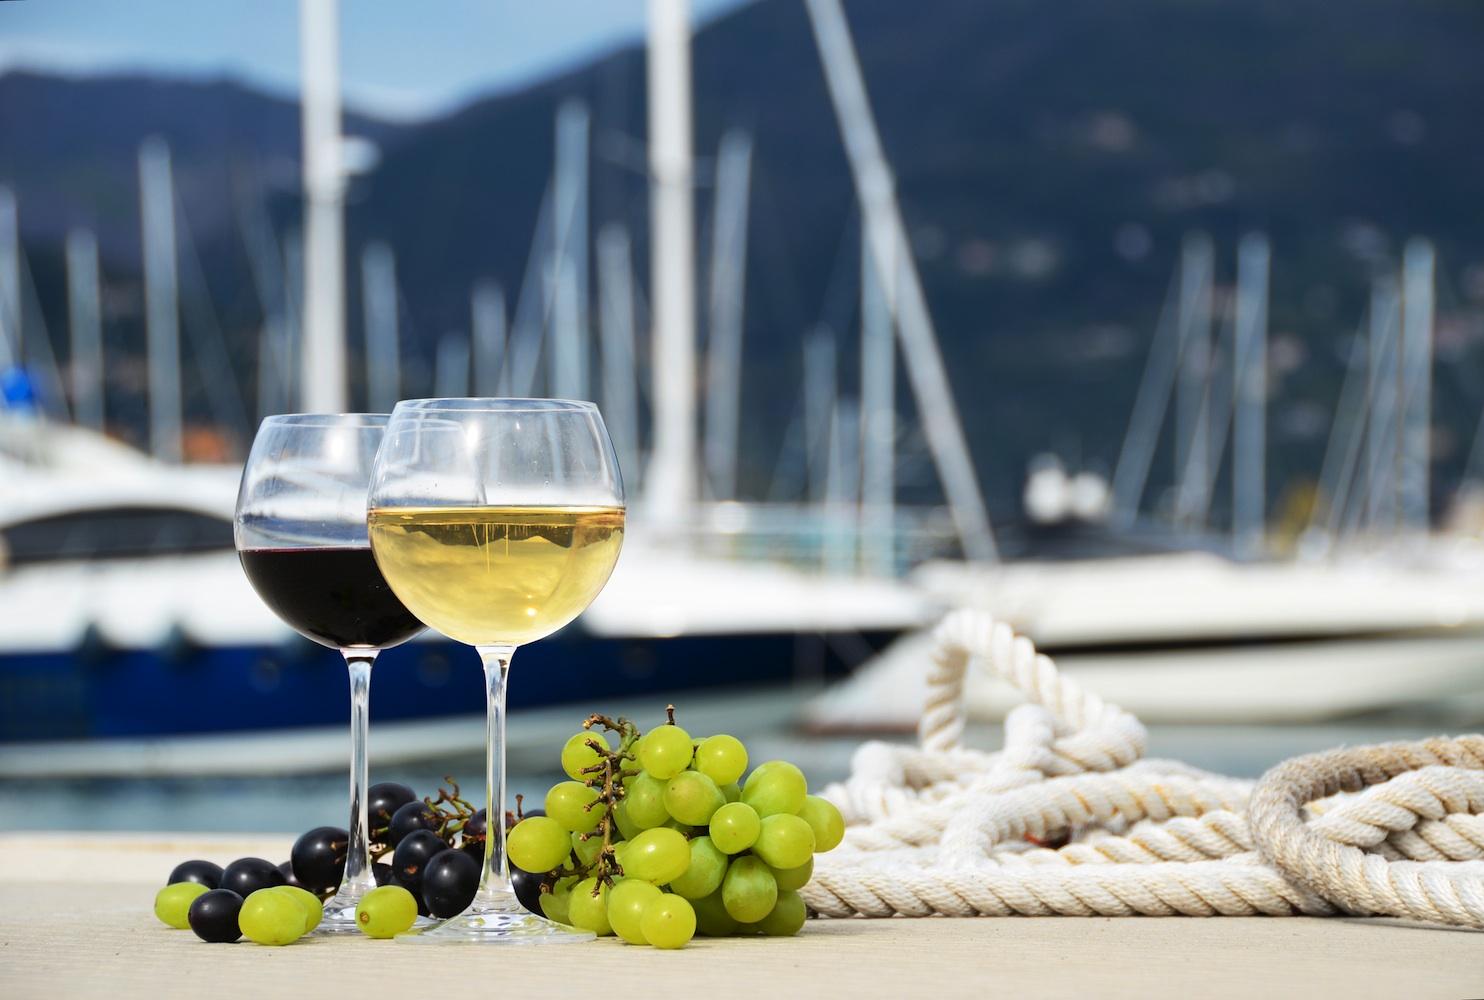 degustazione in barca